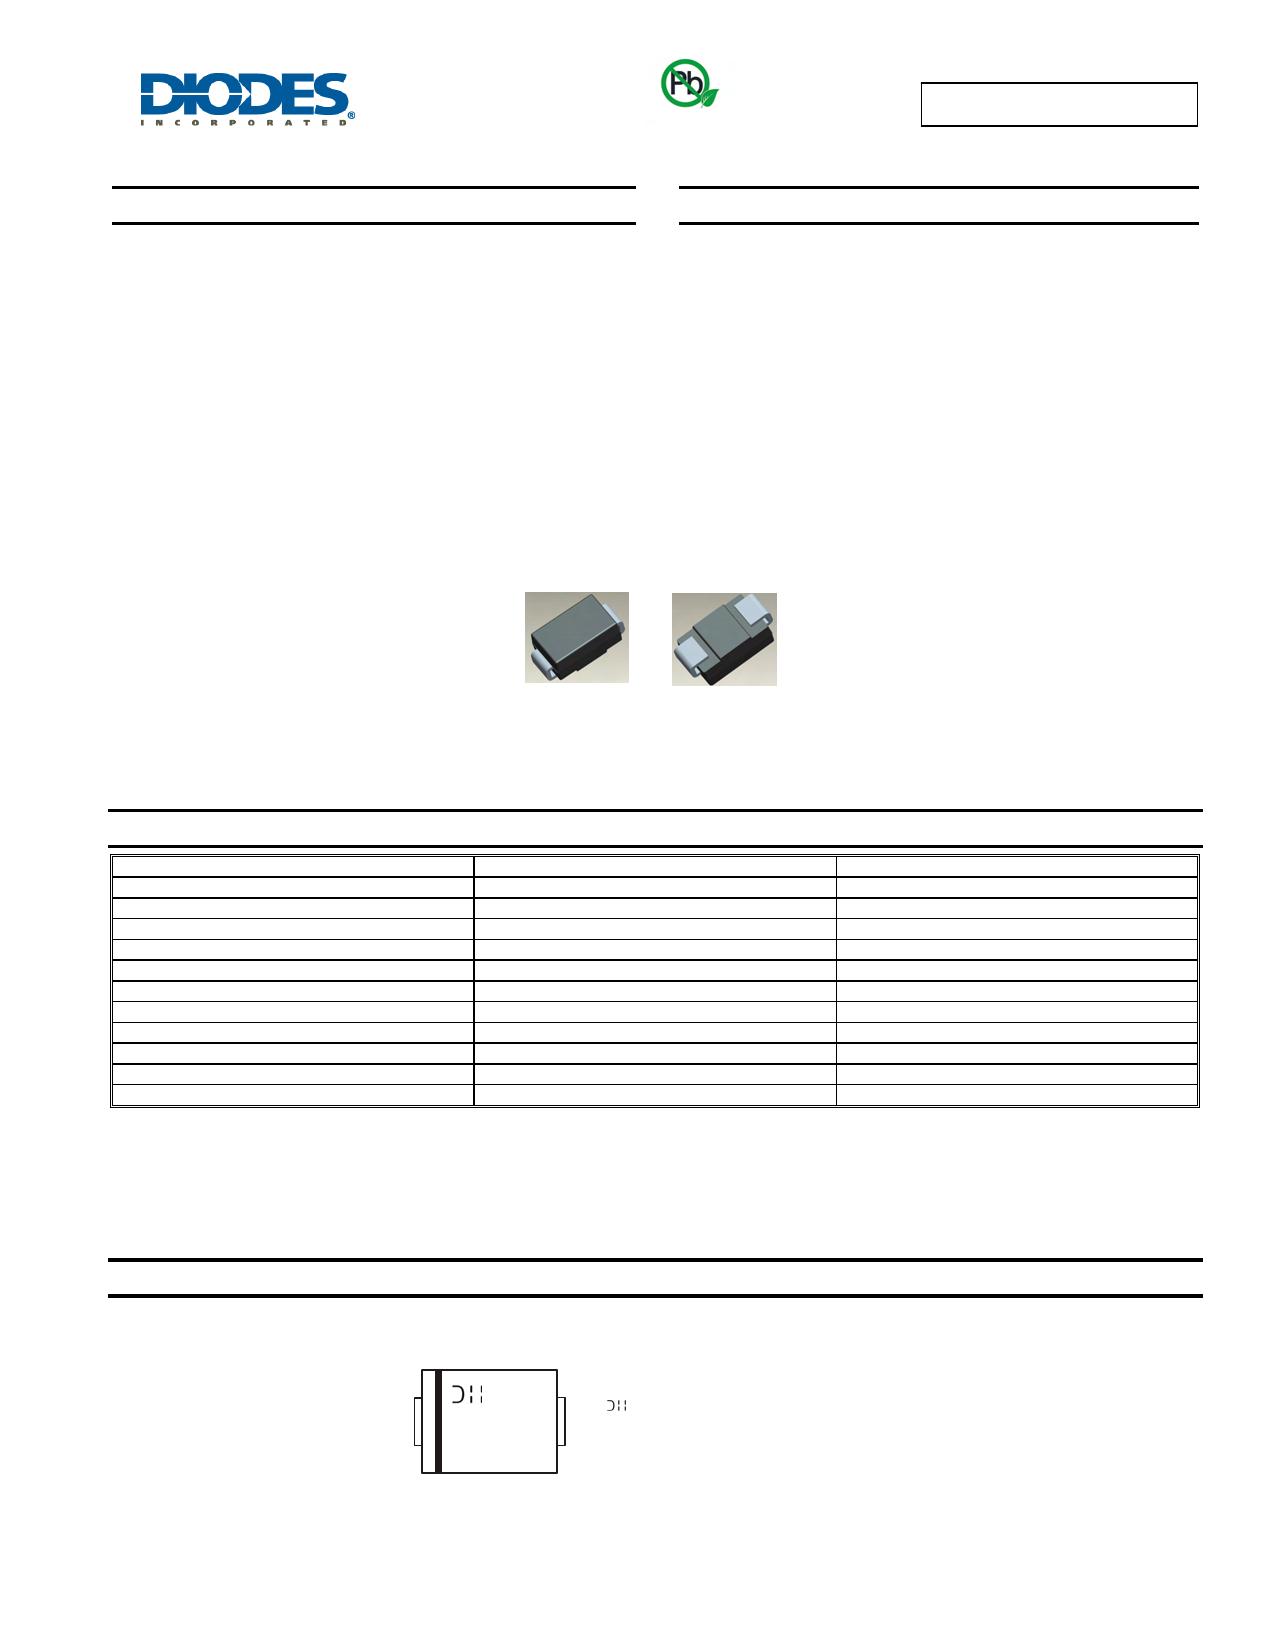 TB0900M datasheet